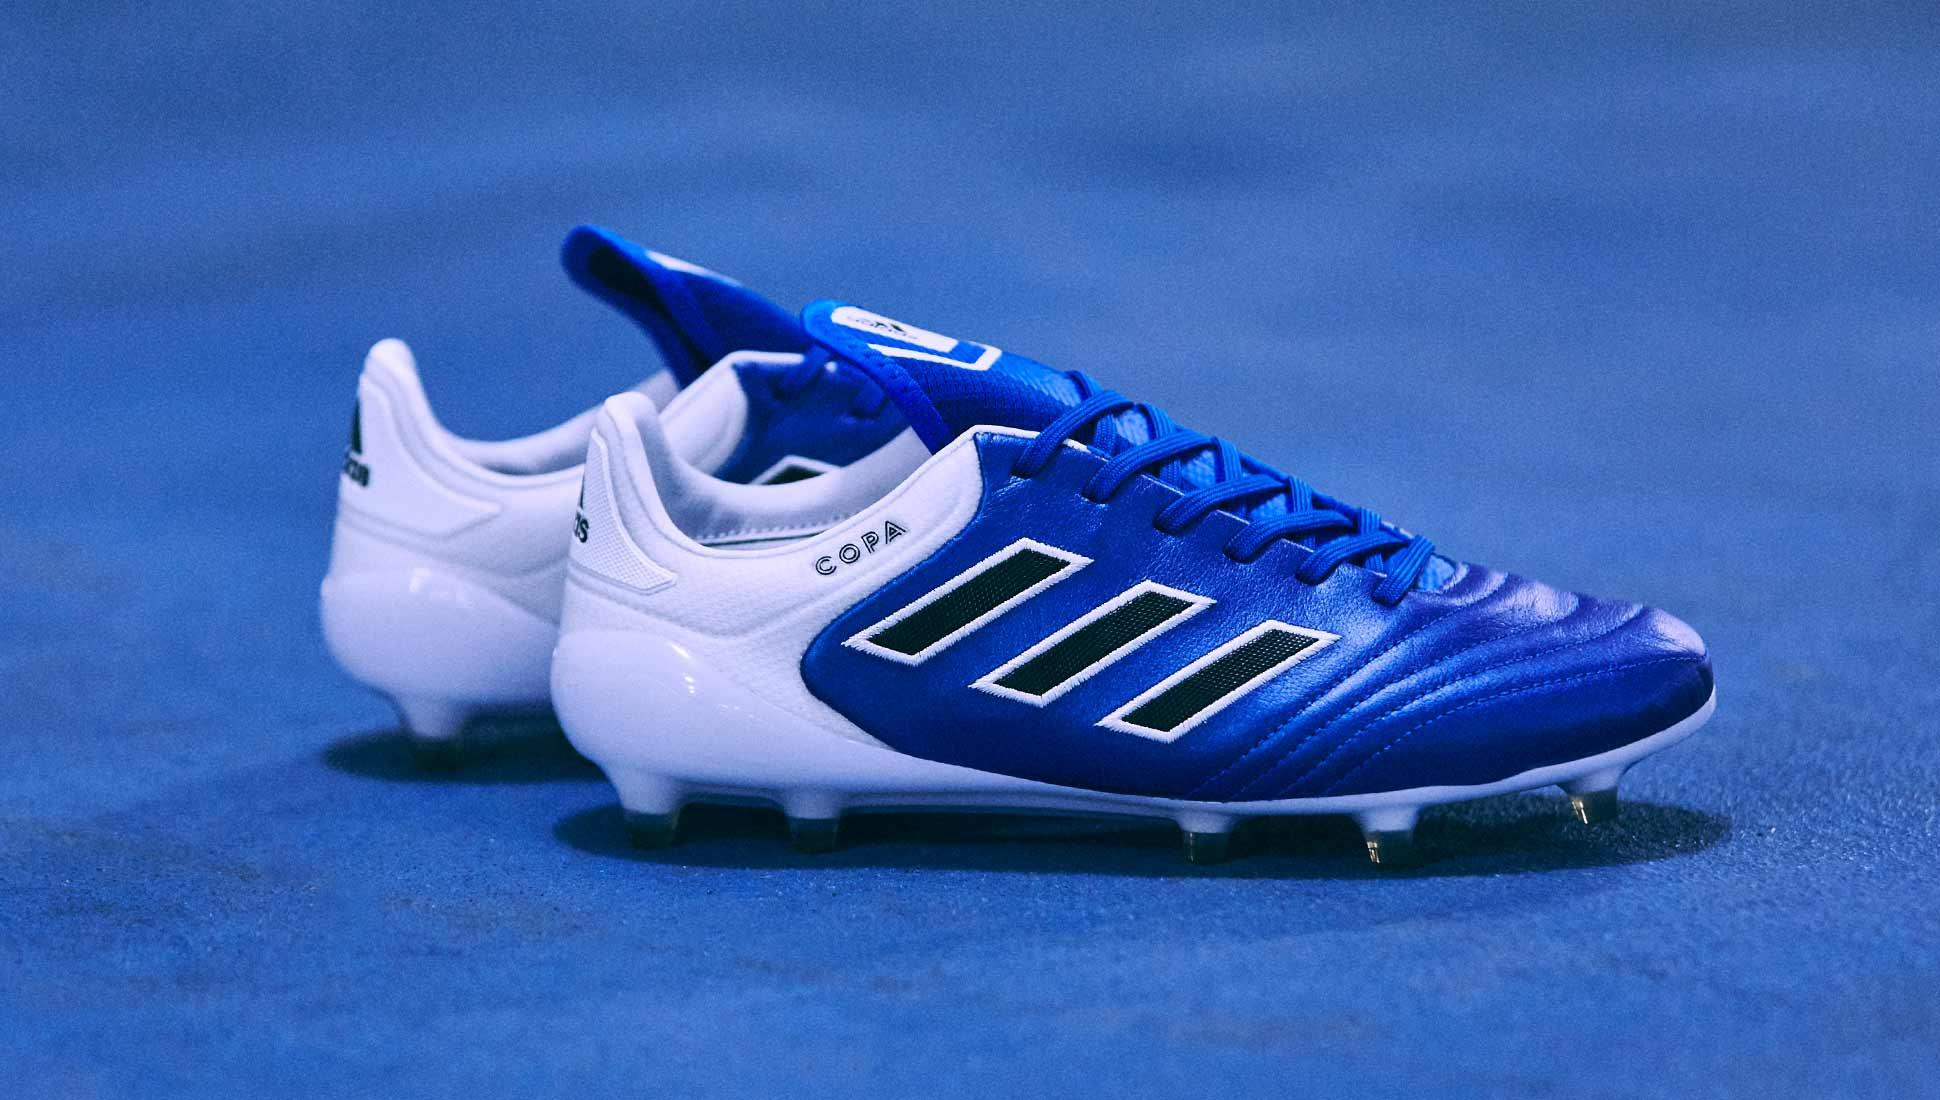 adidas Copa 17.1 Football Boots